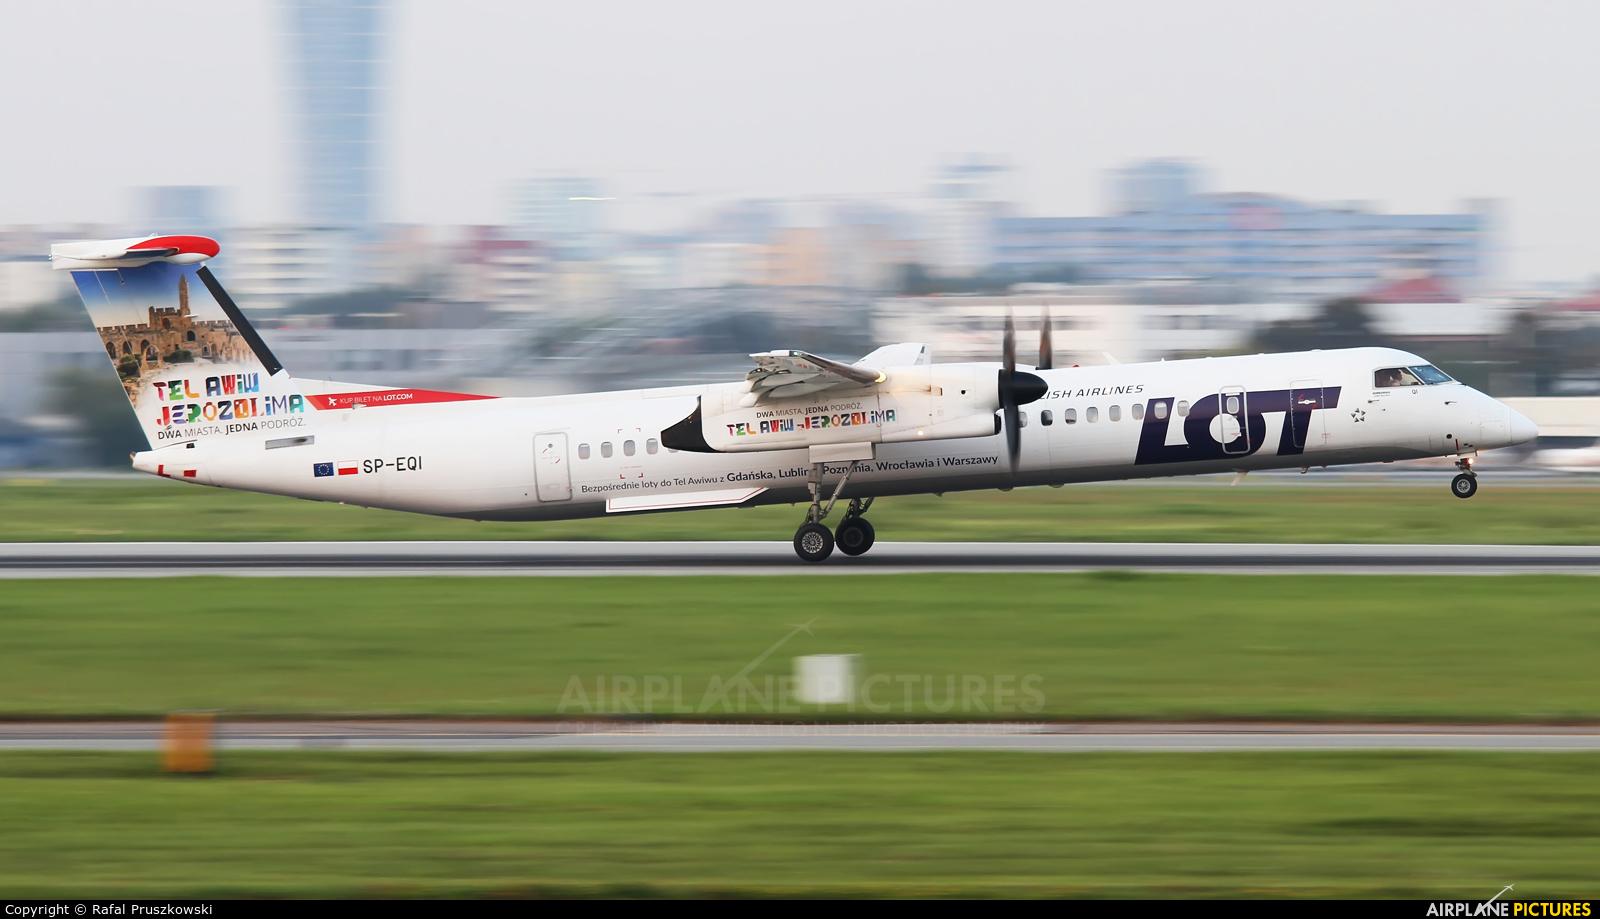 LOT - Polish Airlines SP-EQI aircraft at Warsaw - Frederic Chopin